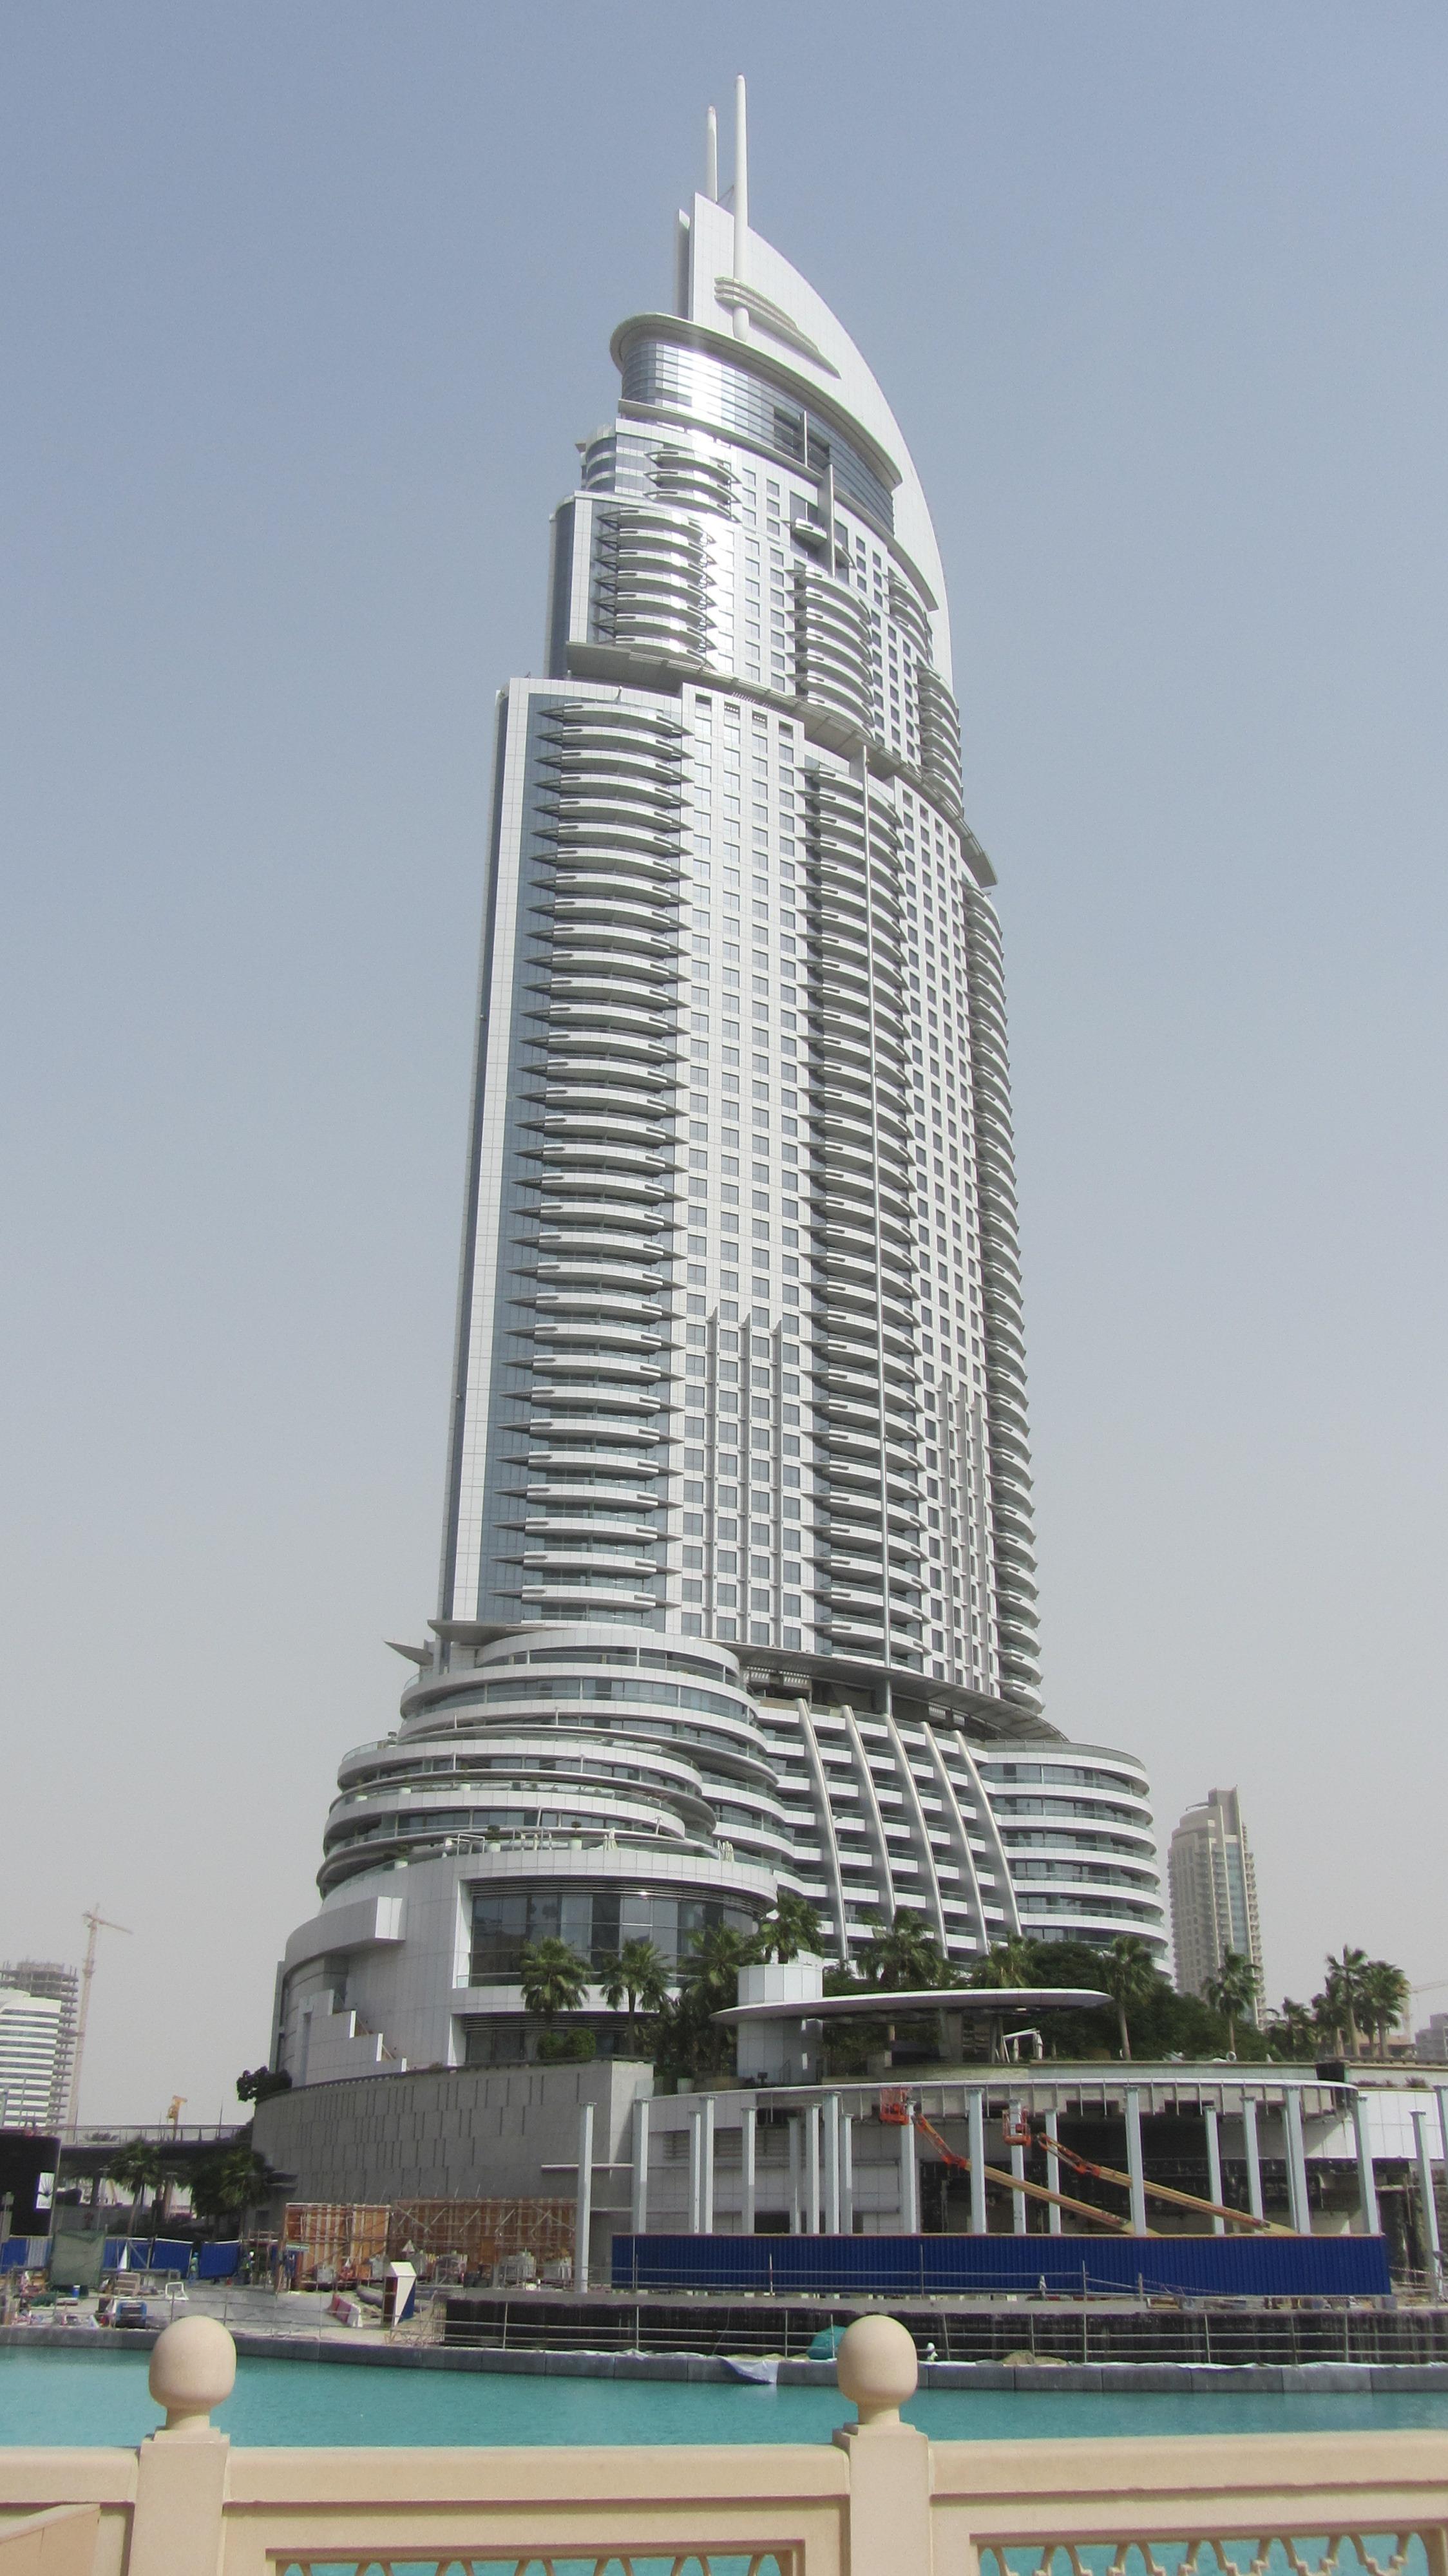 Fotos Gratis Arquitectura Cielo Edificio Rascacielos